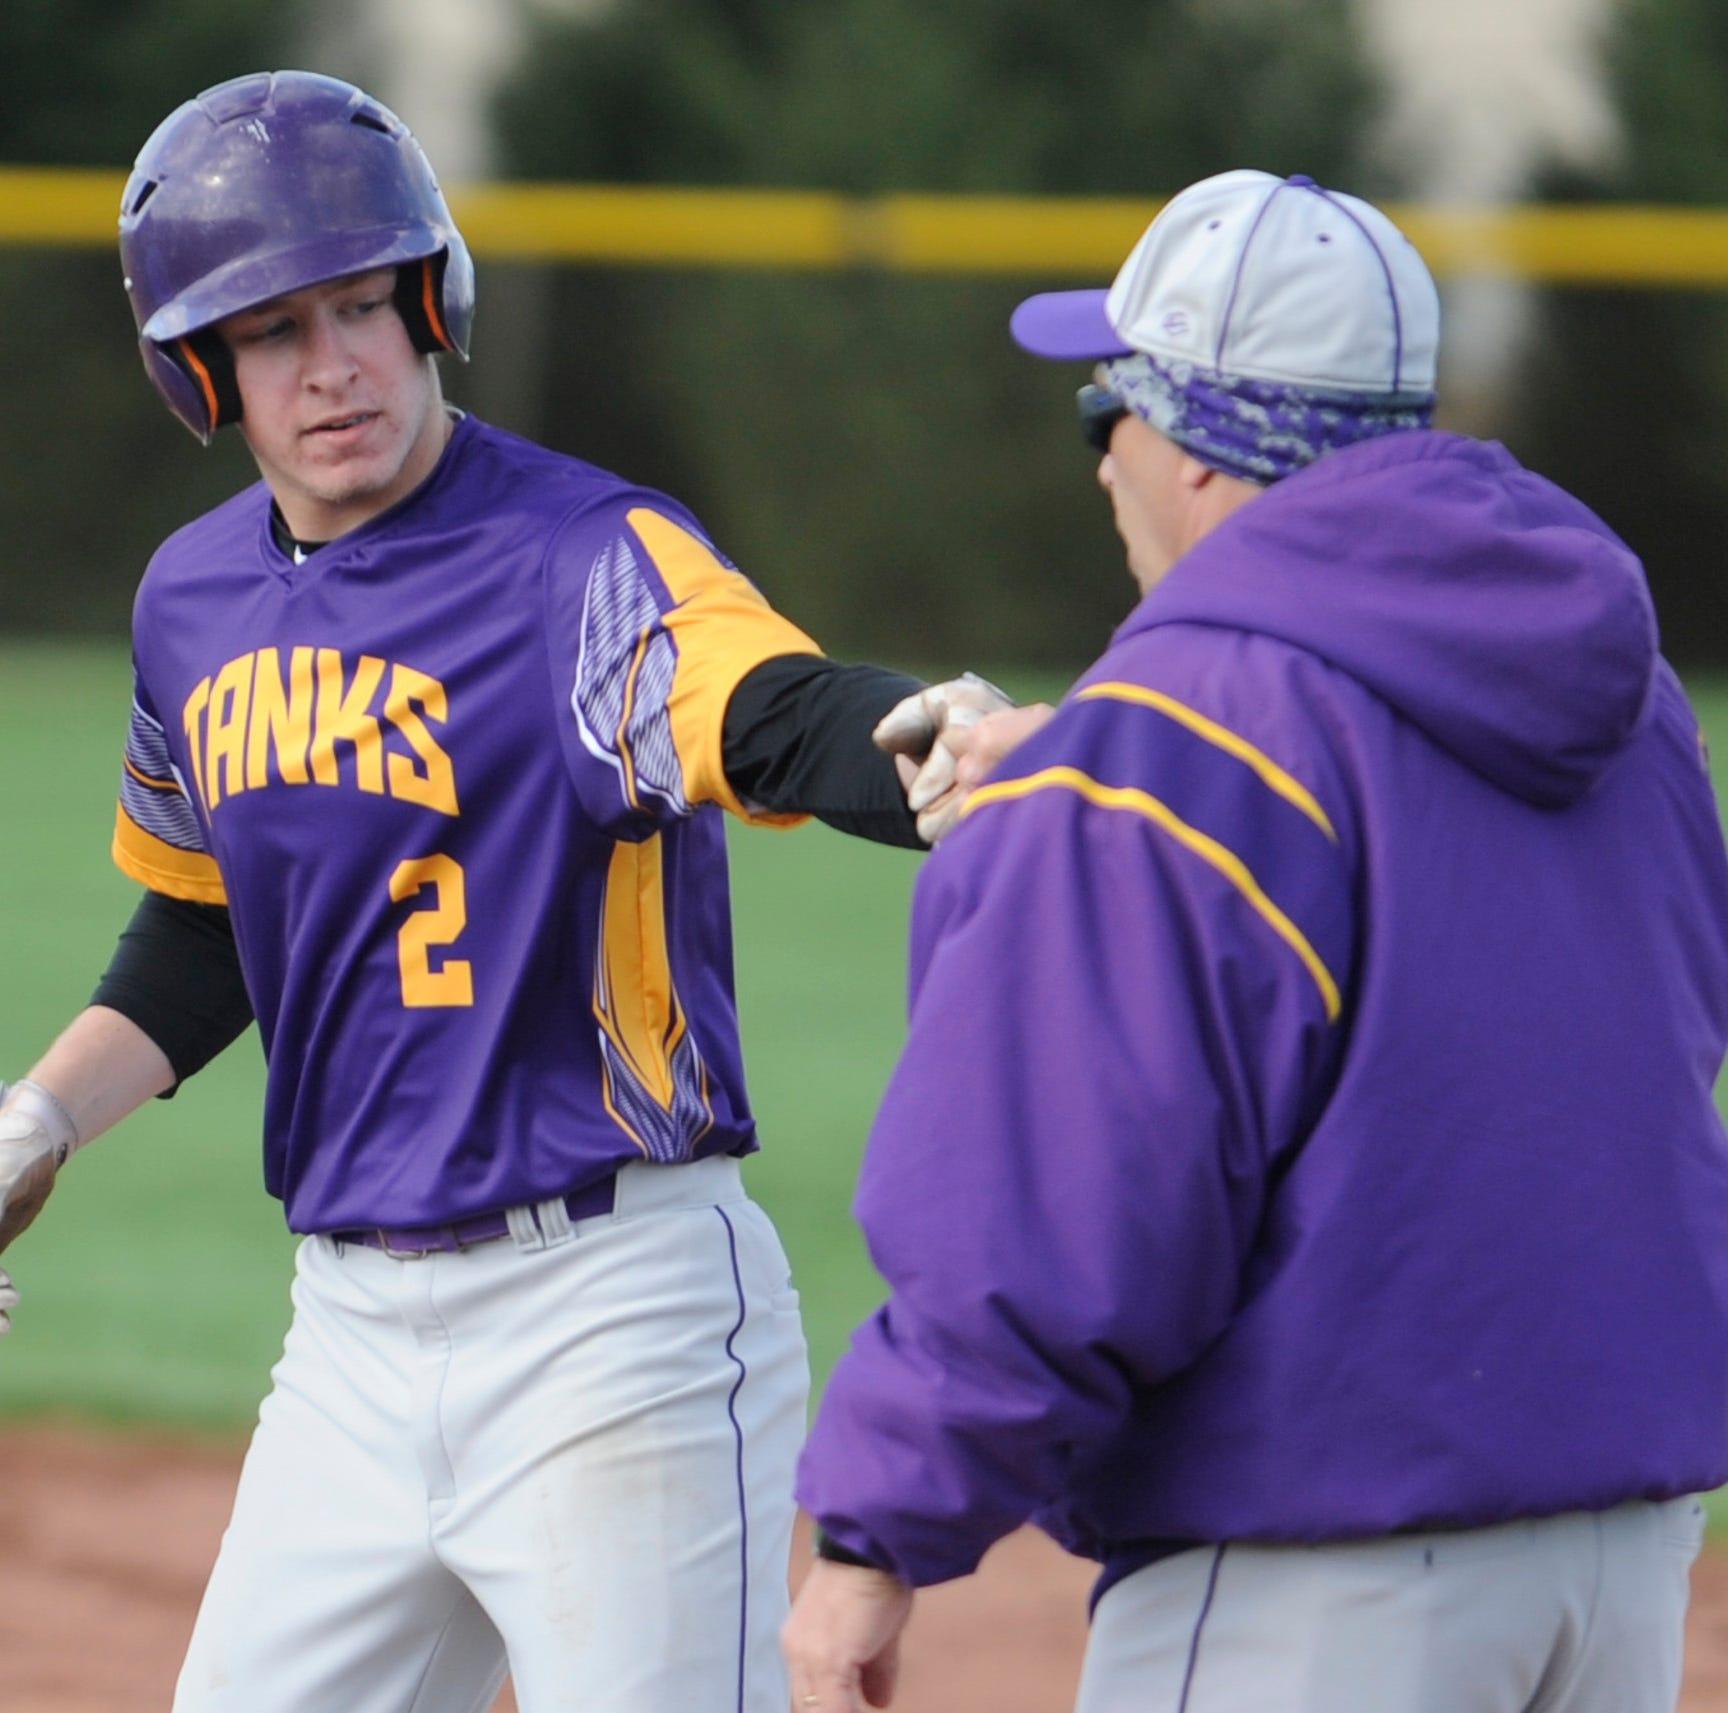 Ohio high school baseball tournament draws released